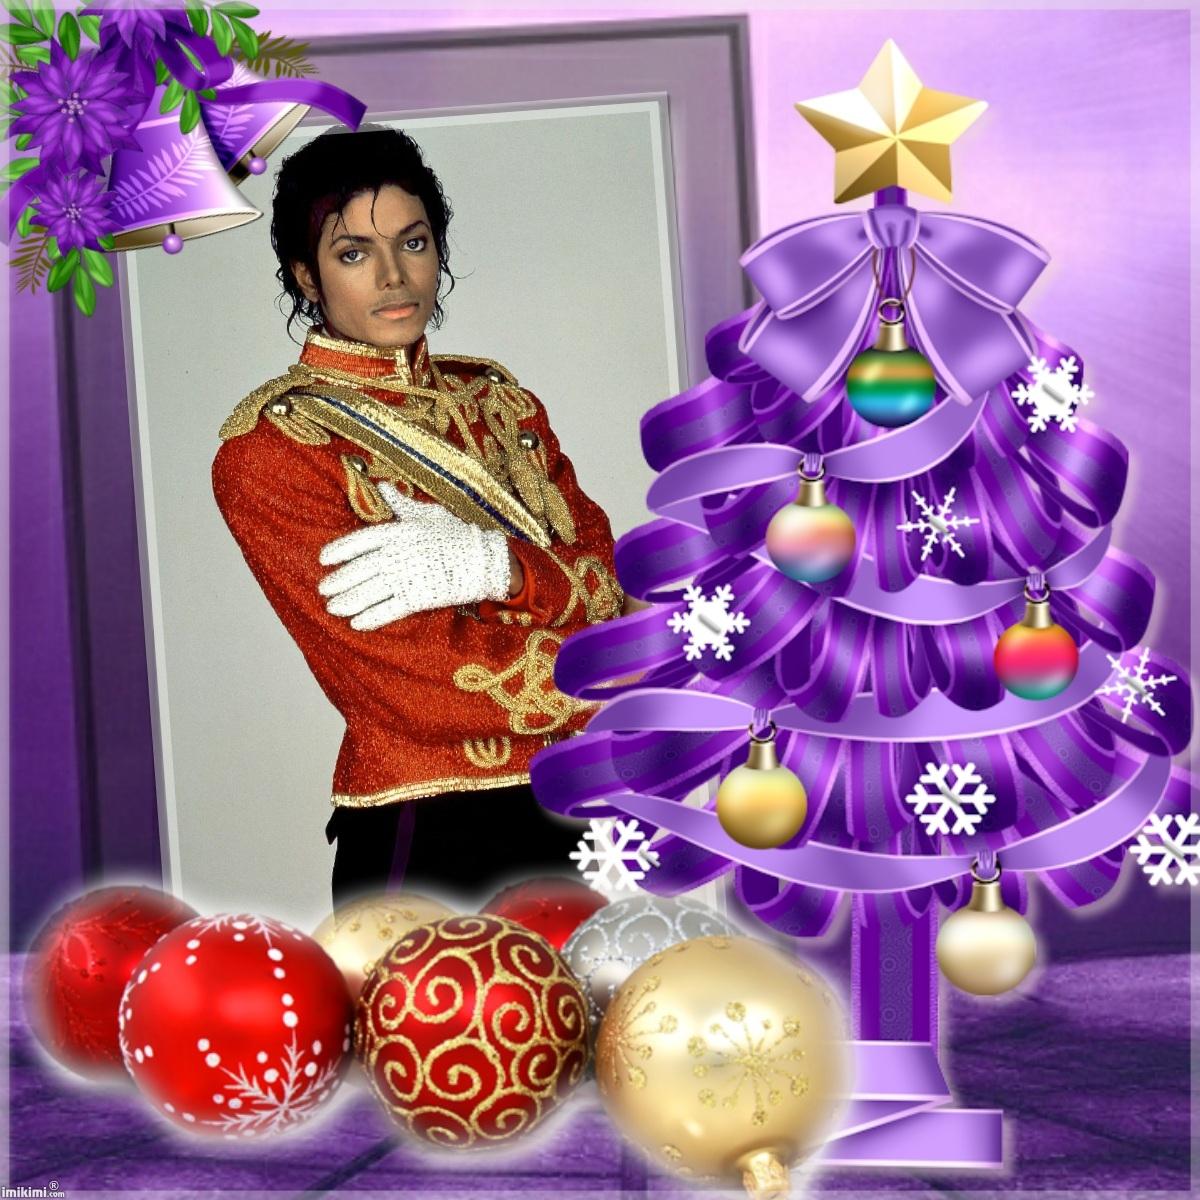 MERRY CHRISTMAS,MICHAEL!